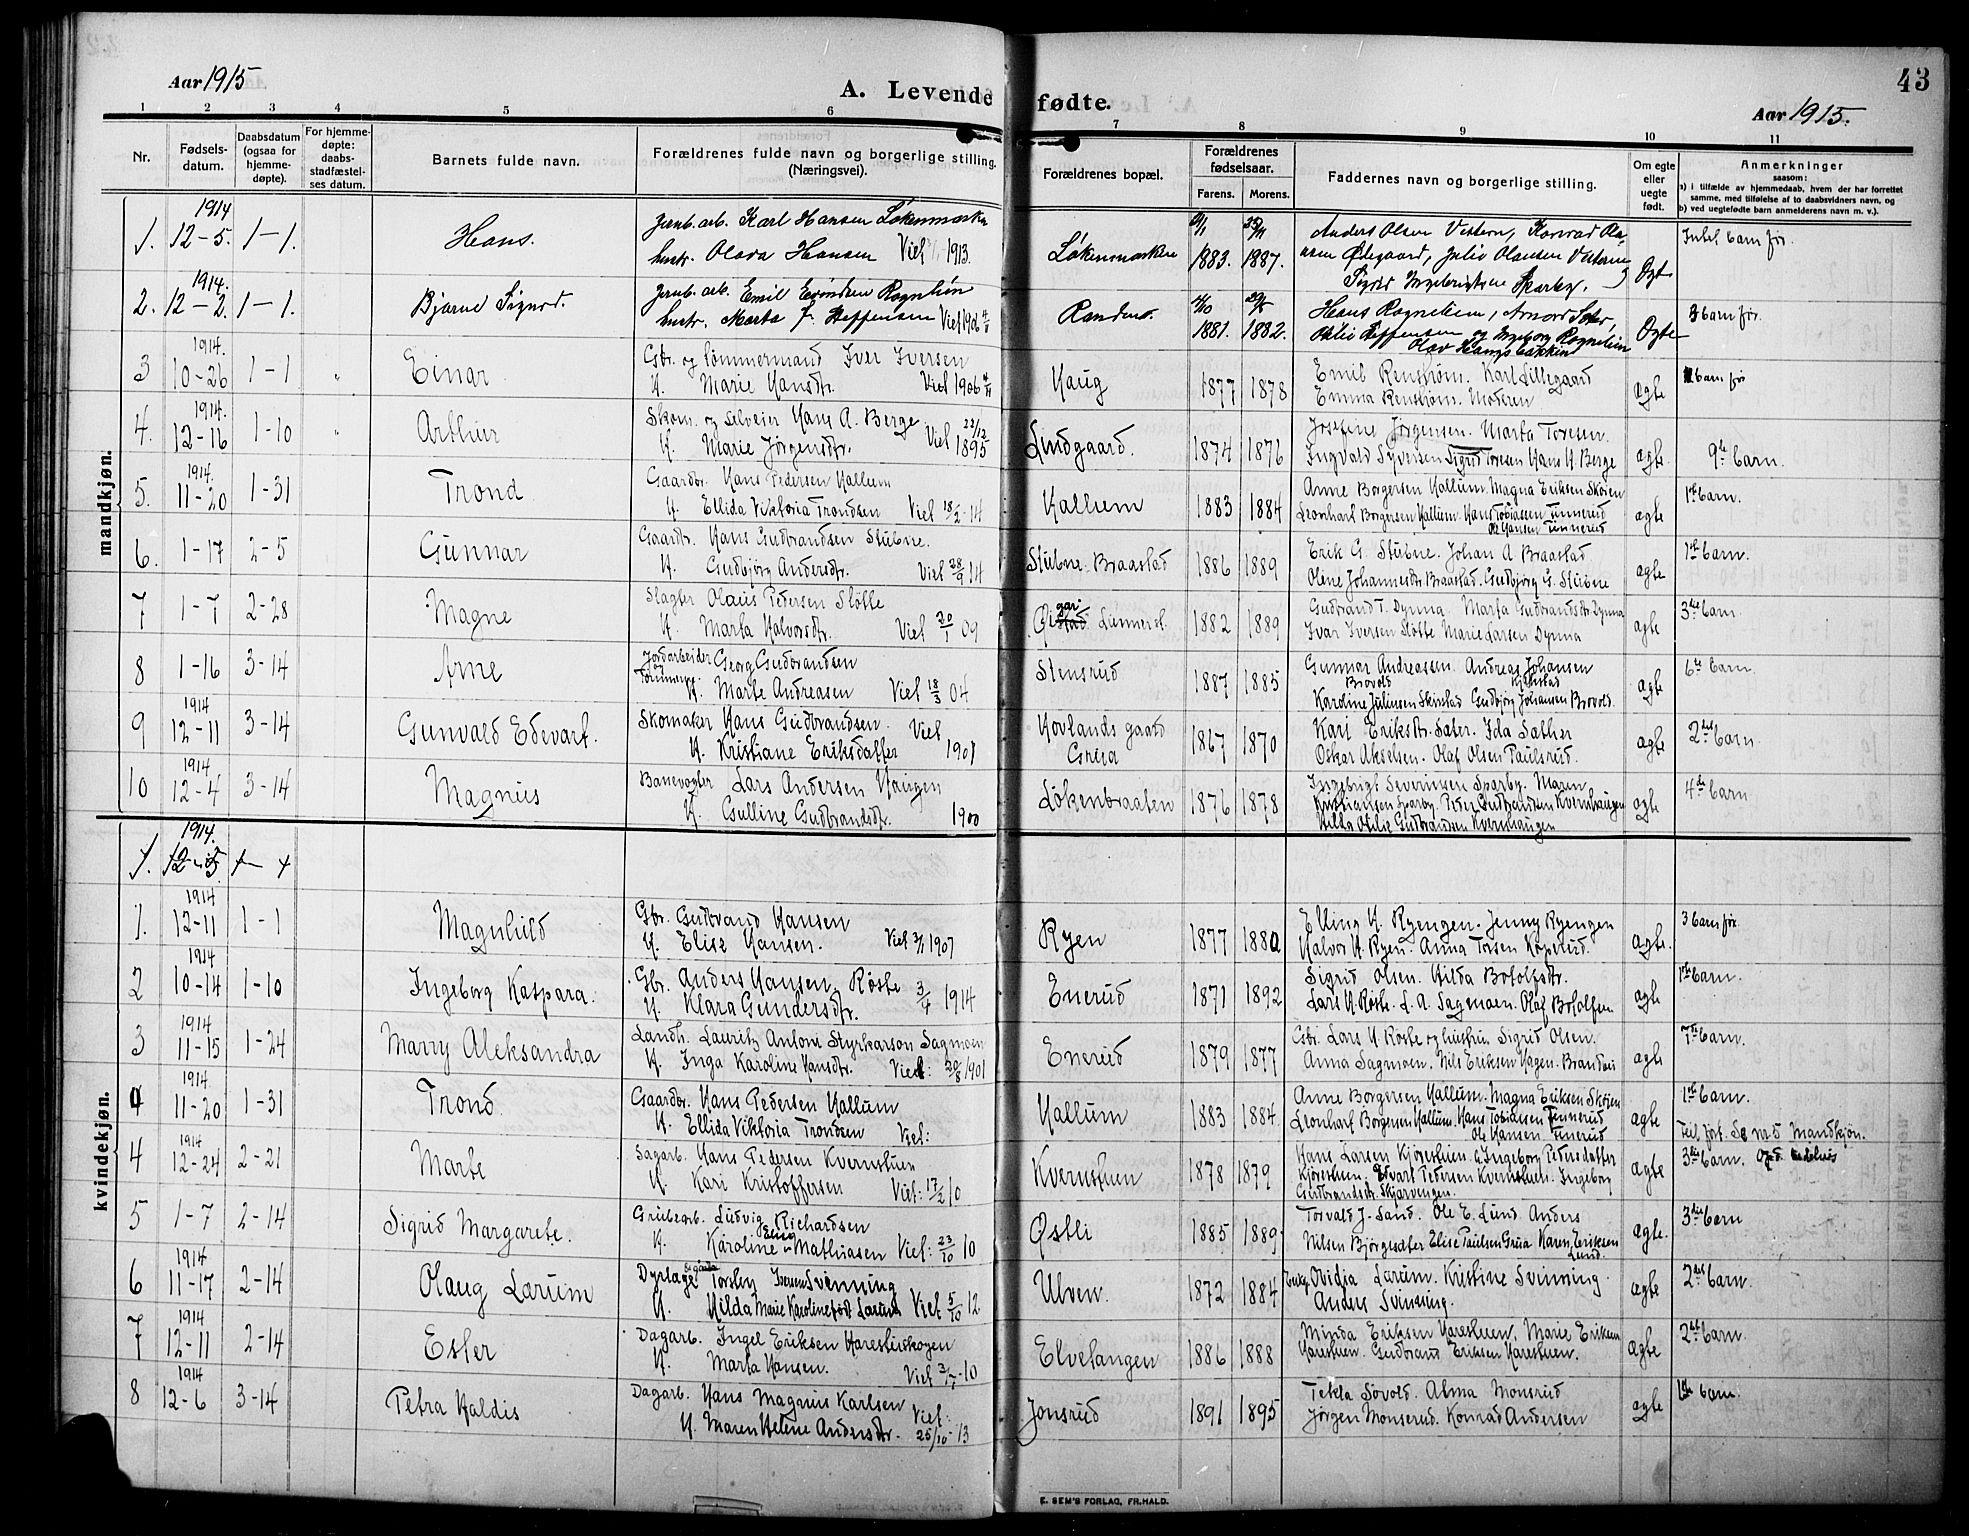 SAH, Lunner prestekontor, H/Ha/Hab/L0001: Klokkerbok nr. 1, 1909-1922, s. 43